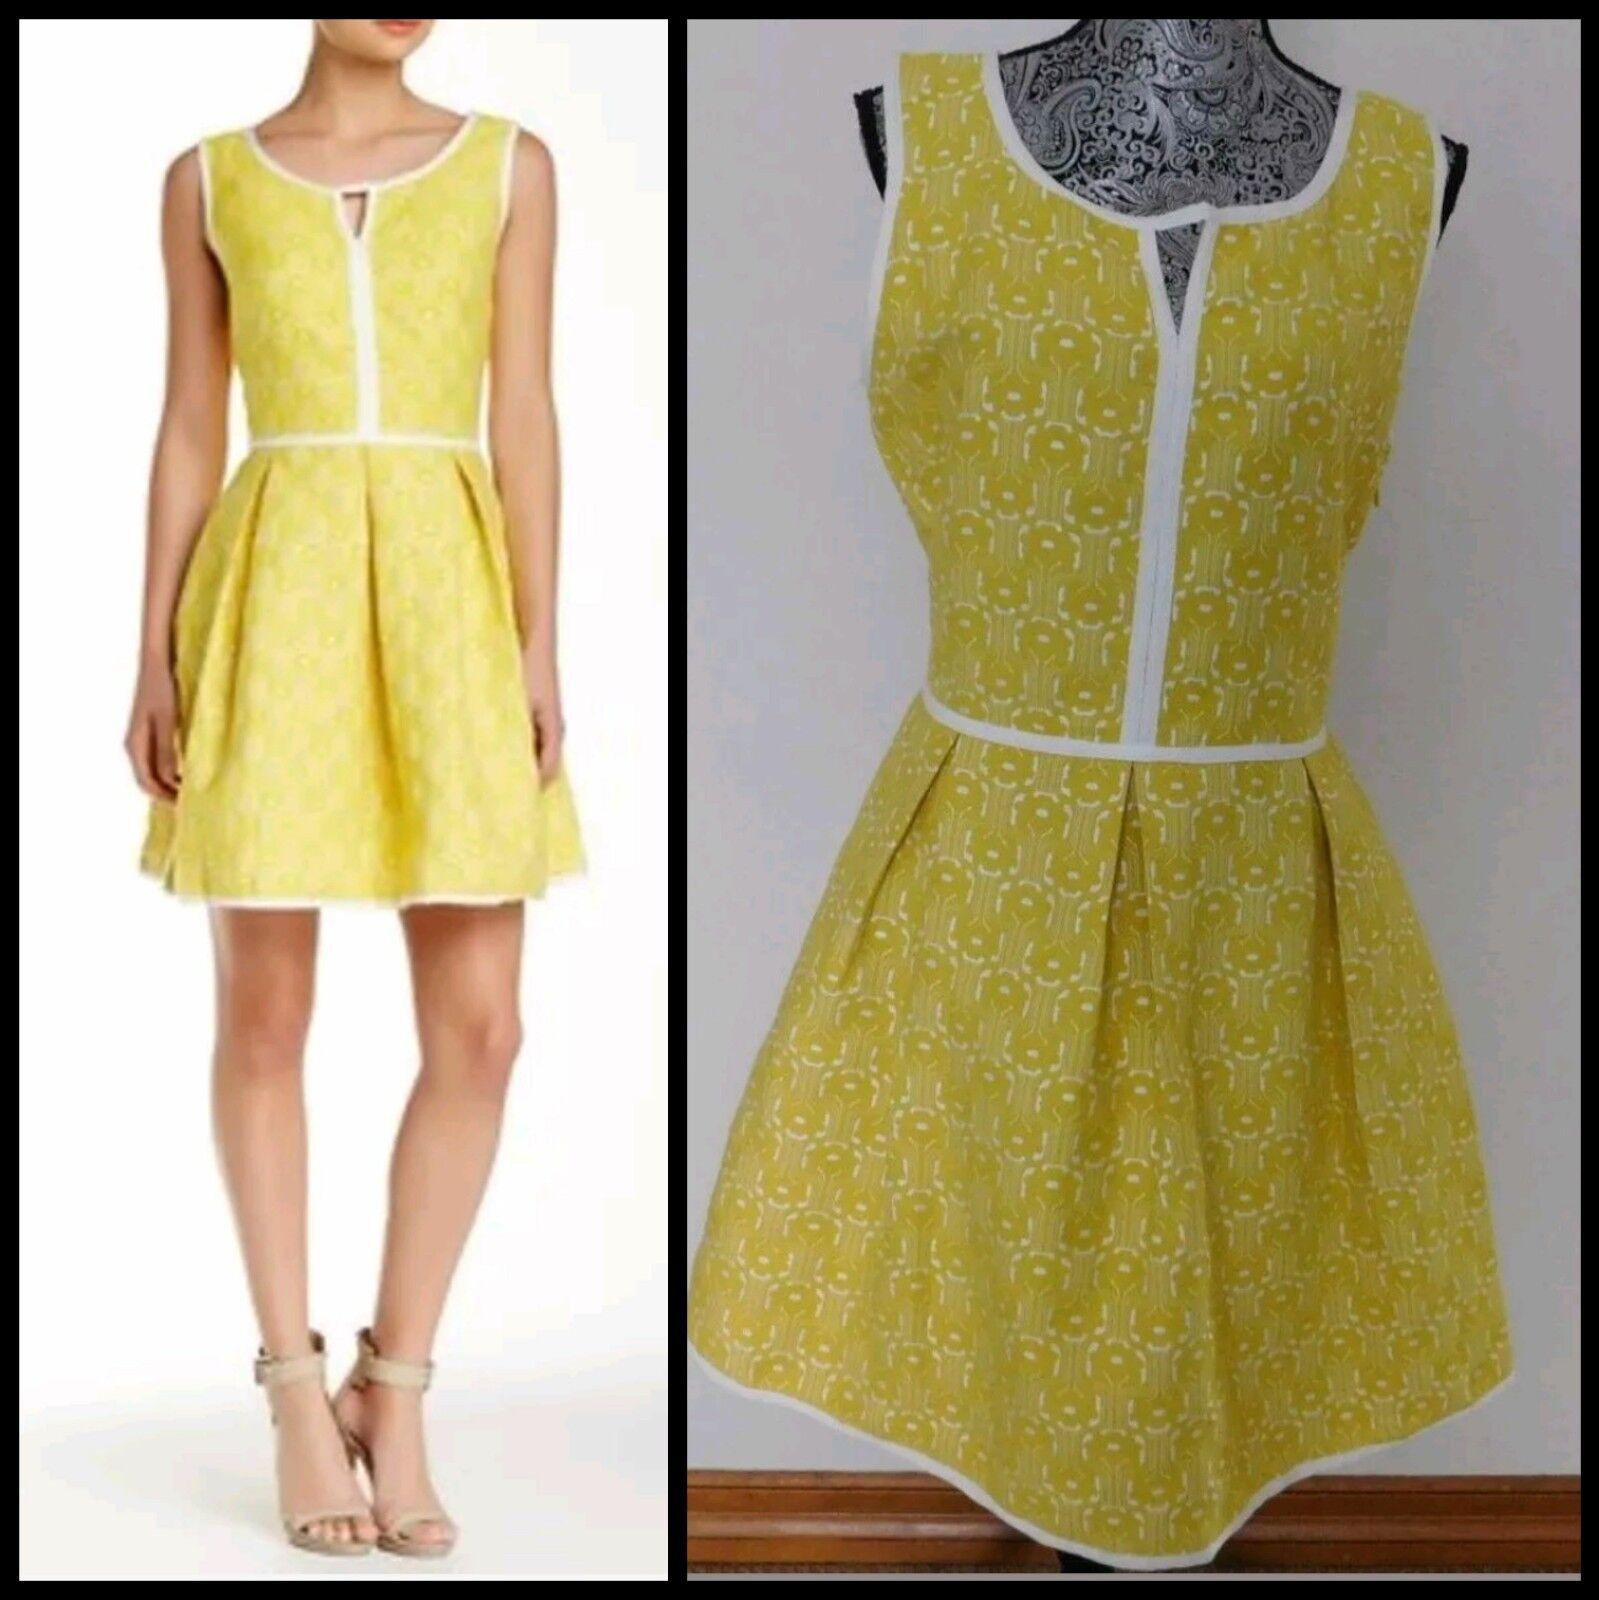 138 Max Studio Yellow & Ivory Jacquard Cotton Blend Fit n Flare Dress  8 M3020